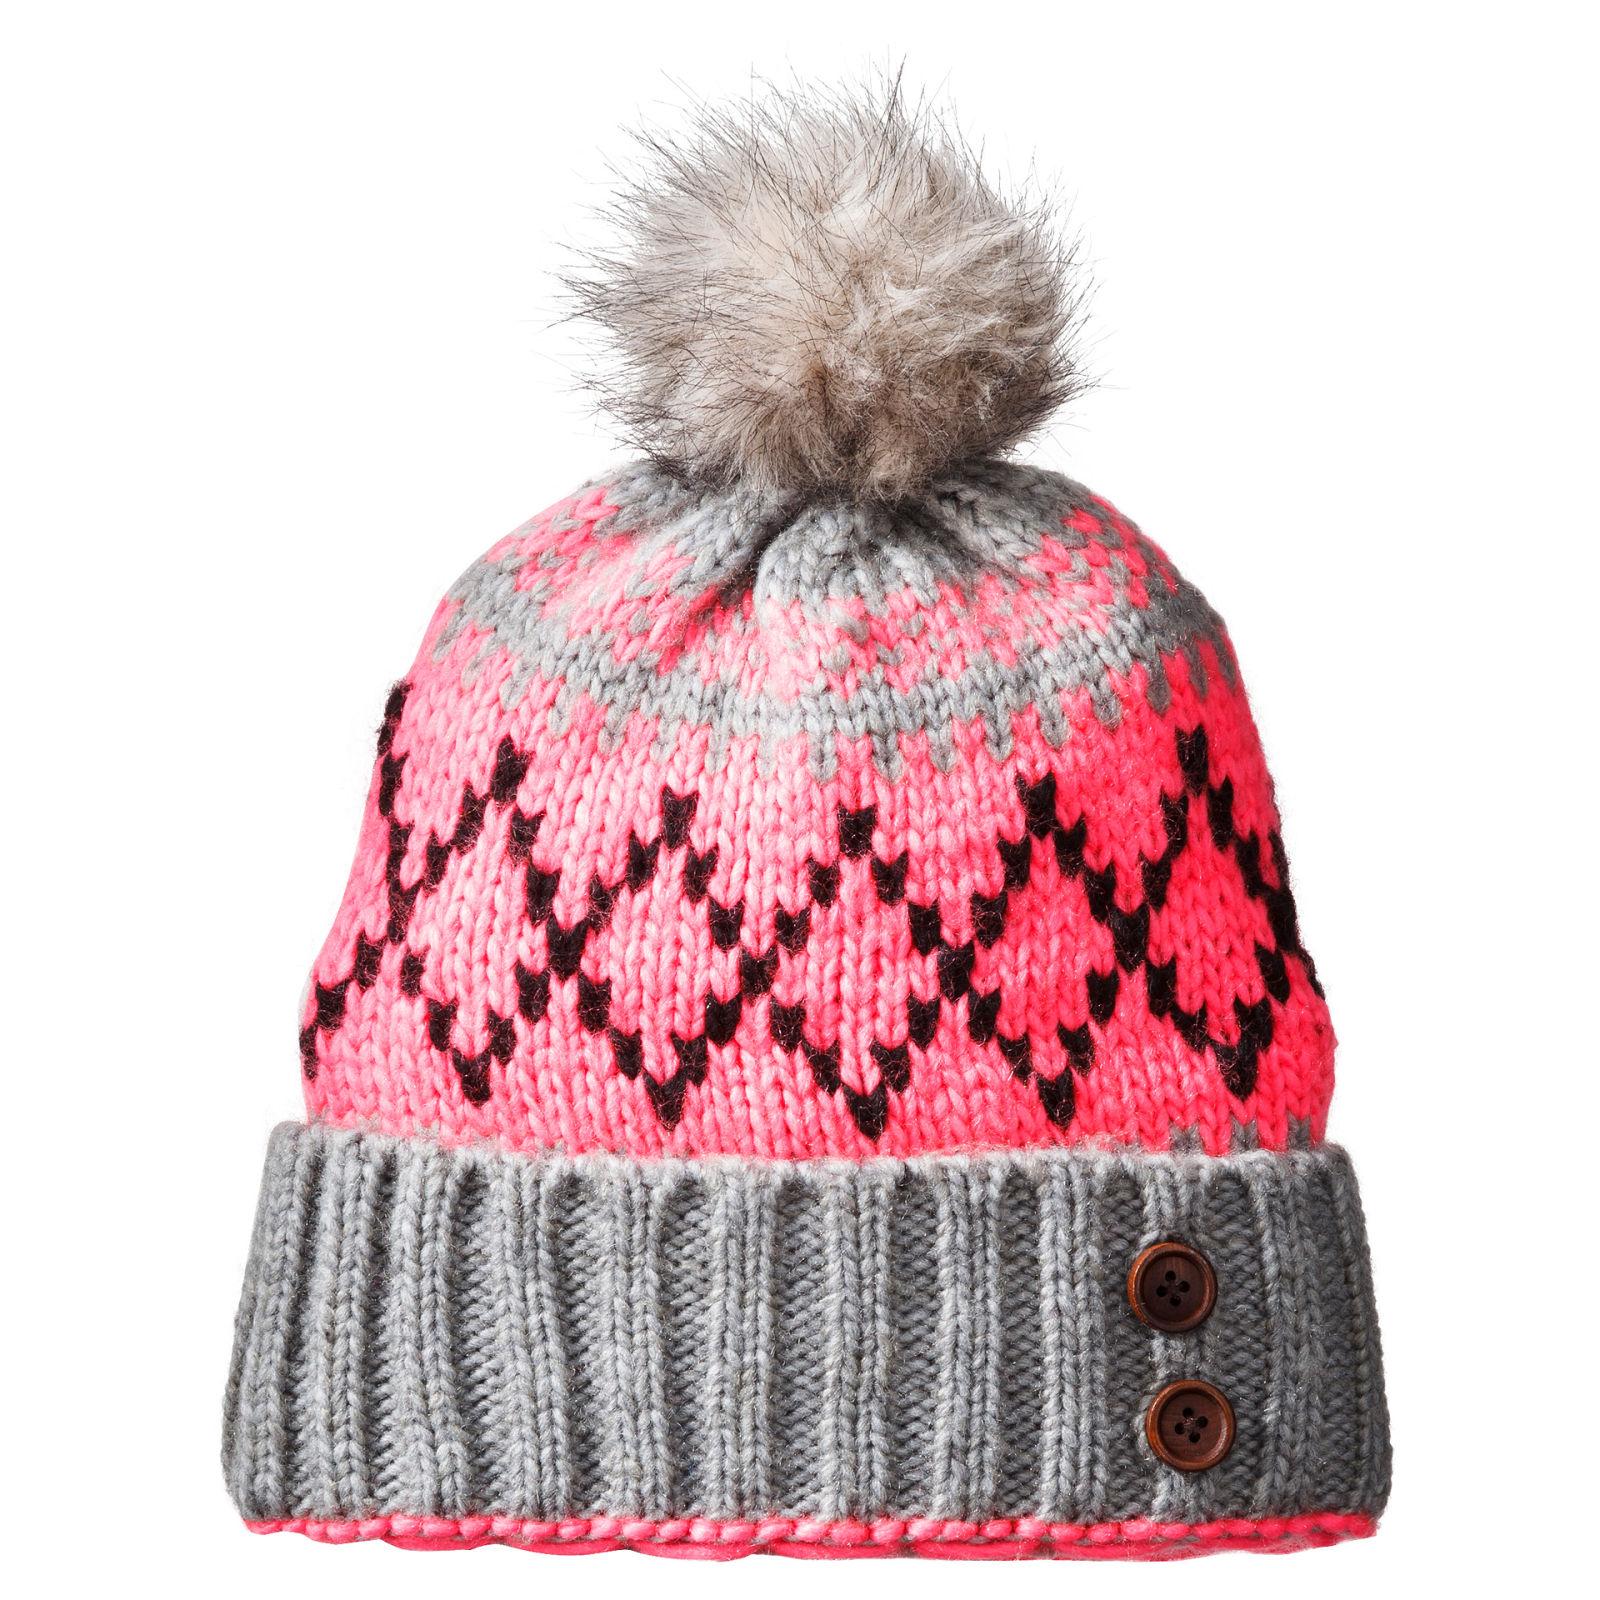 Winter Hats for Women - Stylish Winter Hats